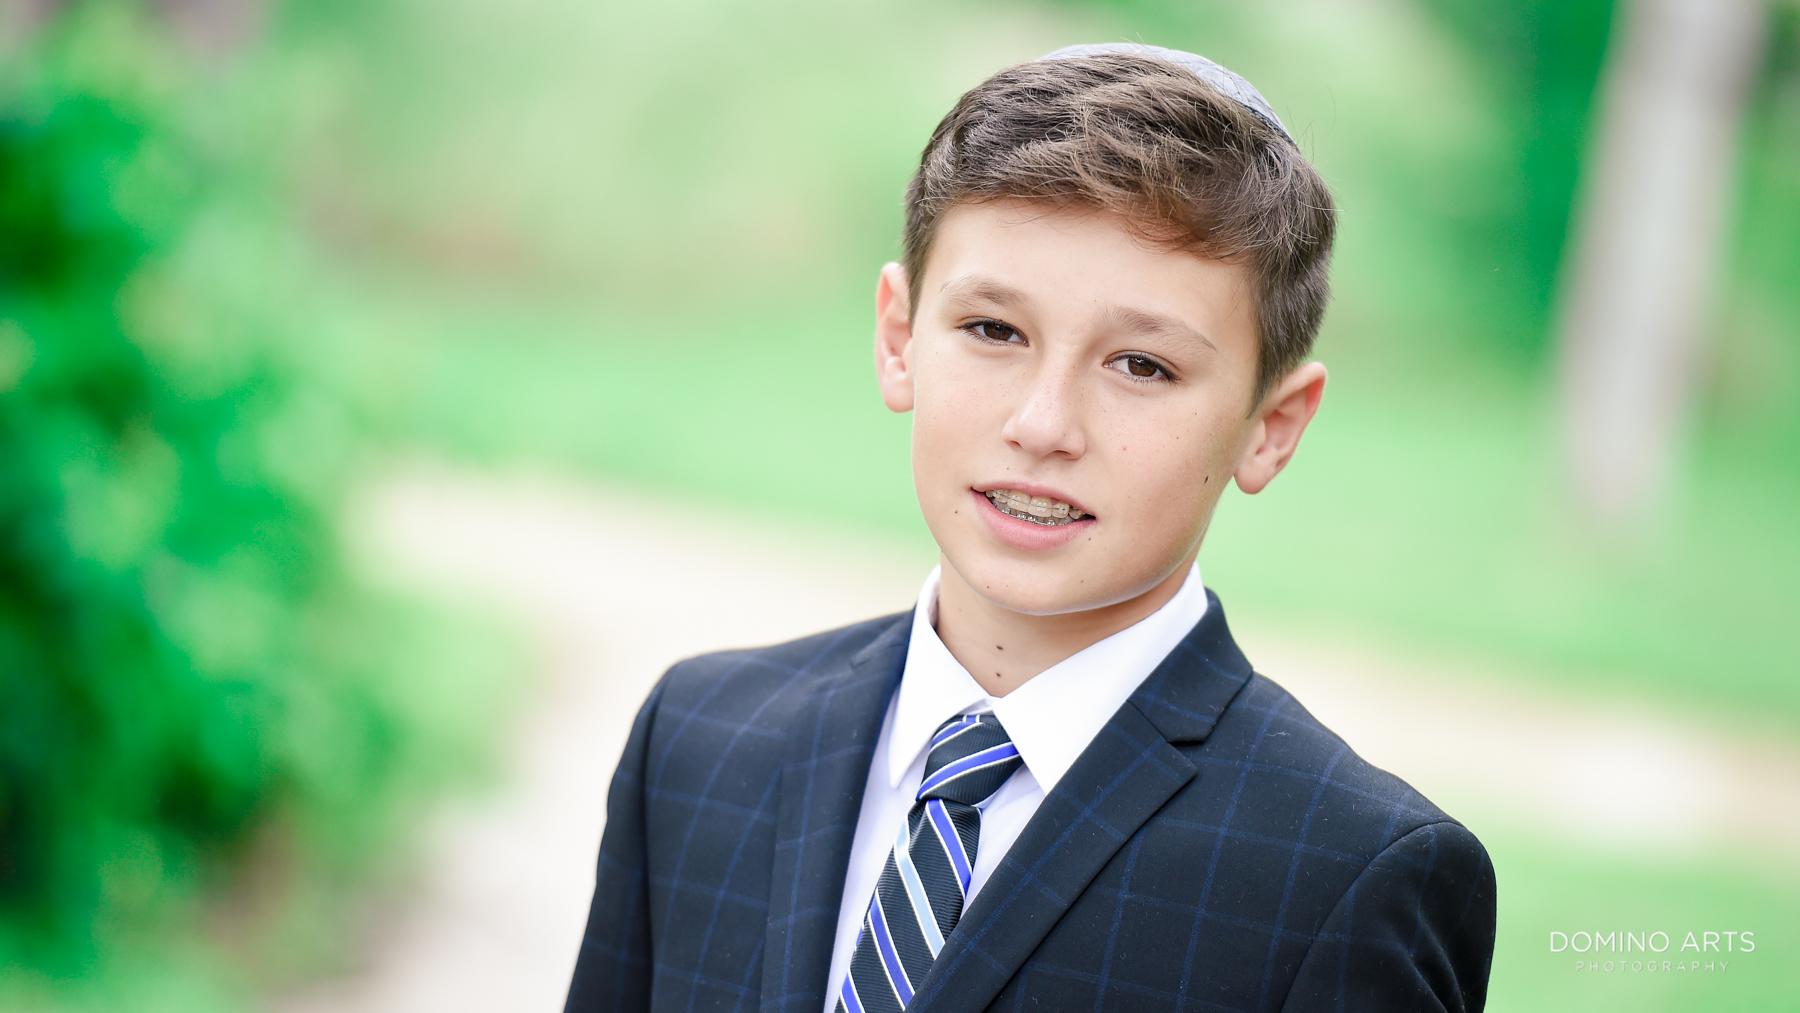 Mitzvah boy portraits Parkland, Florida